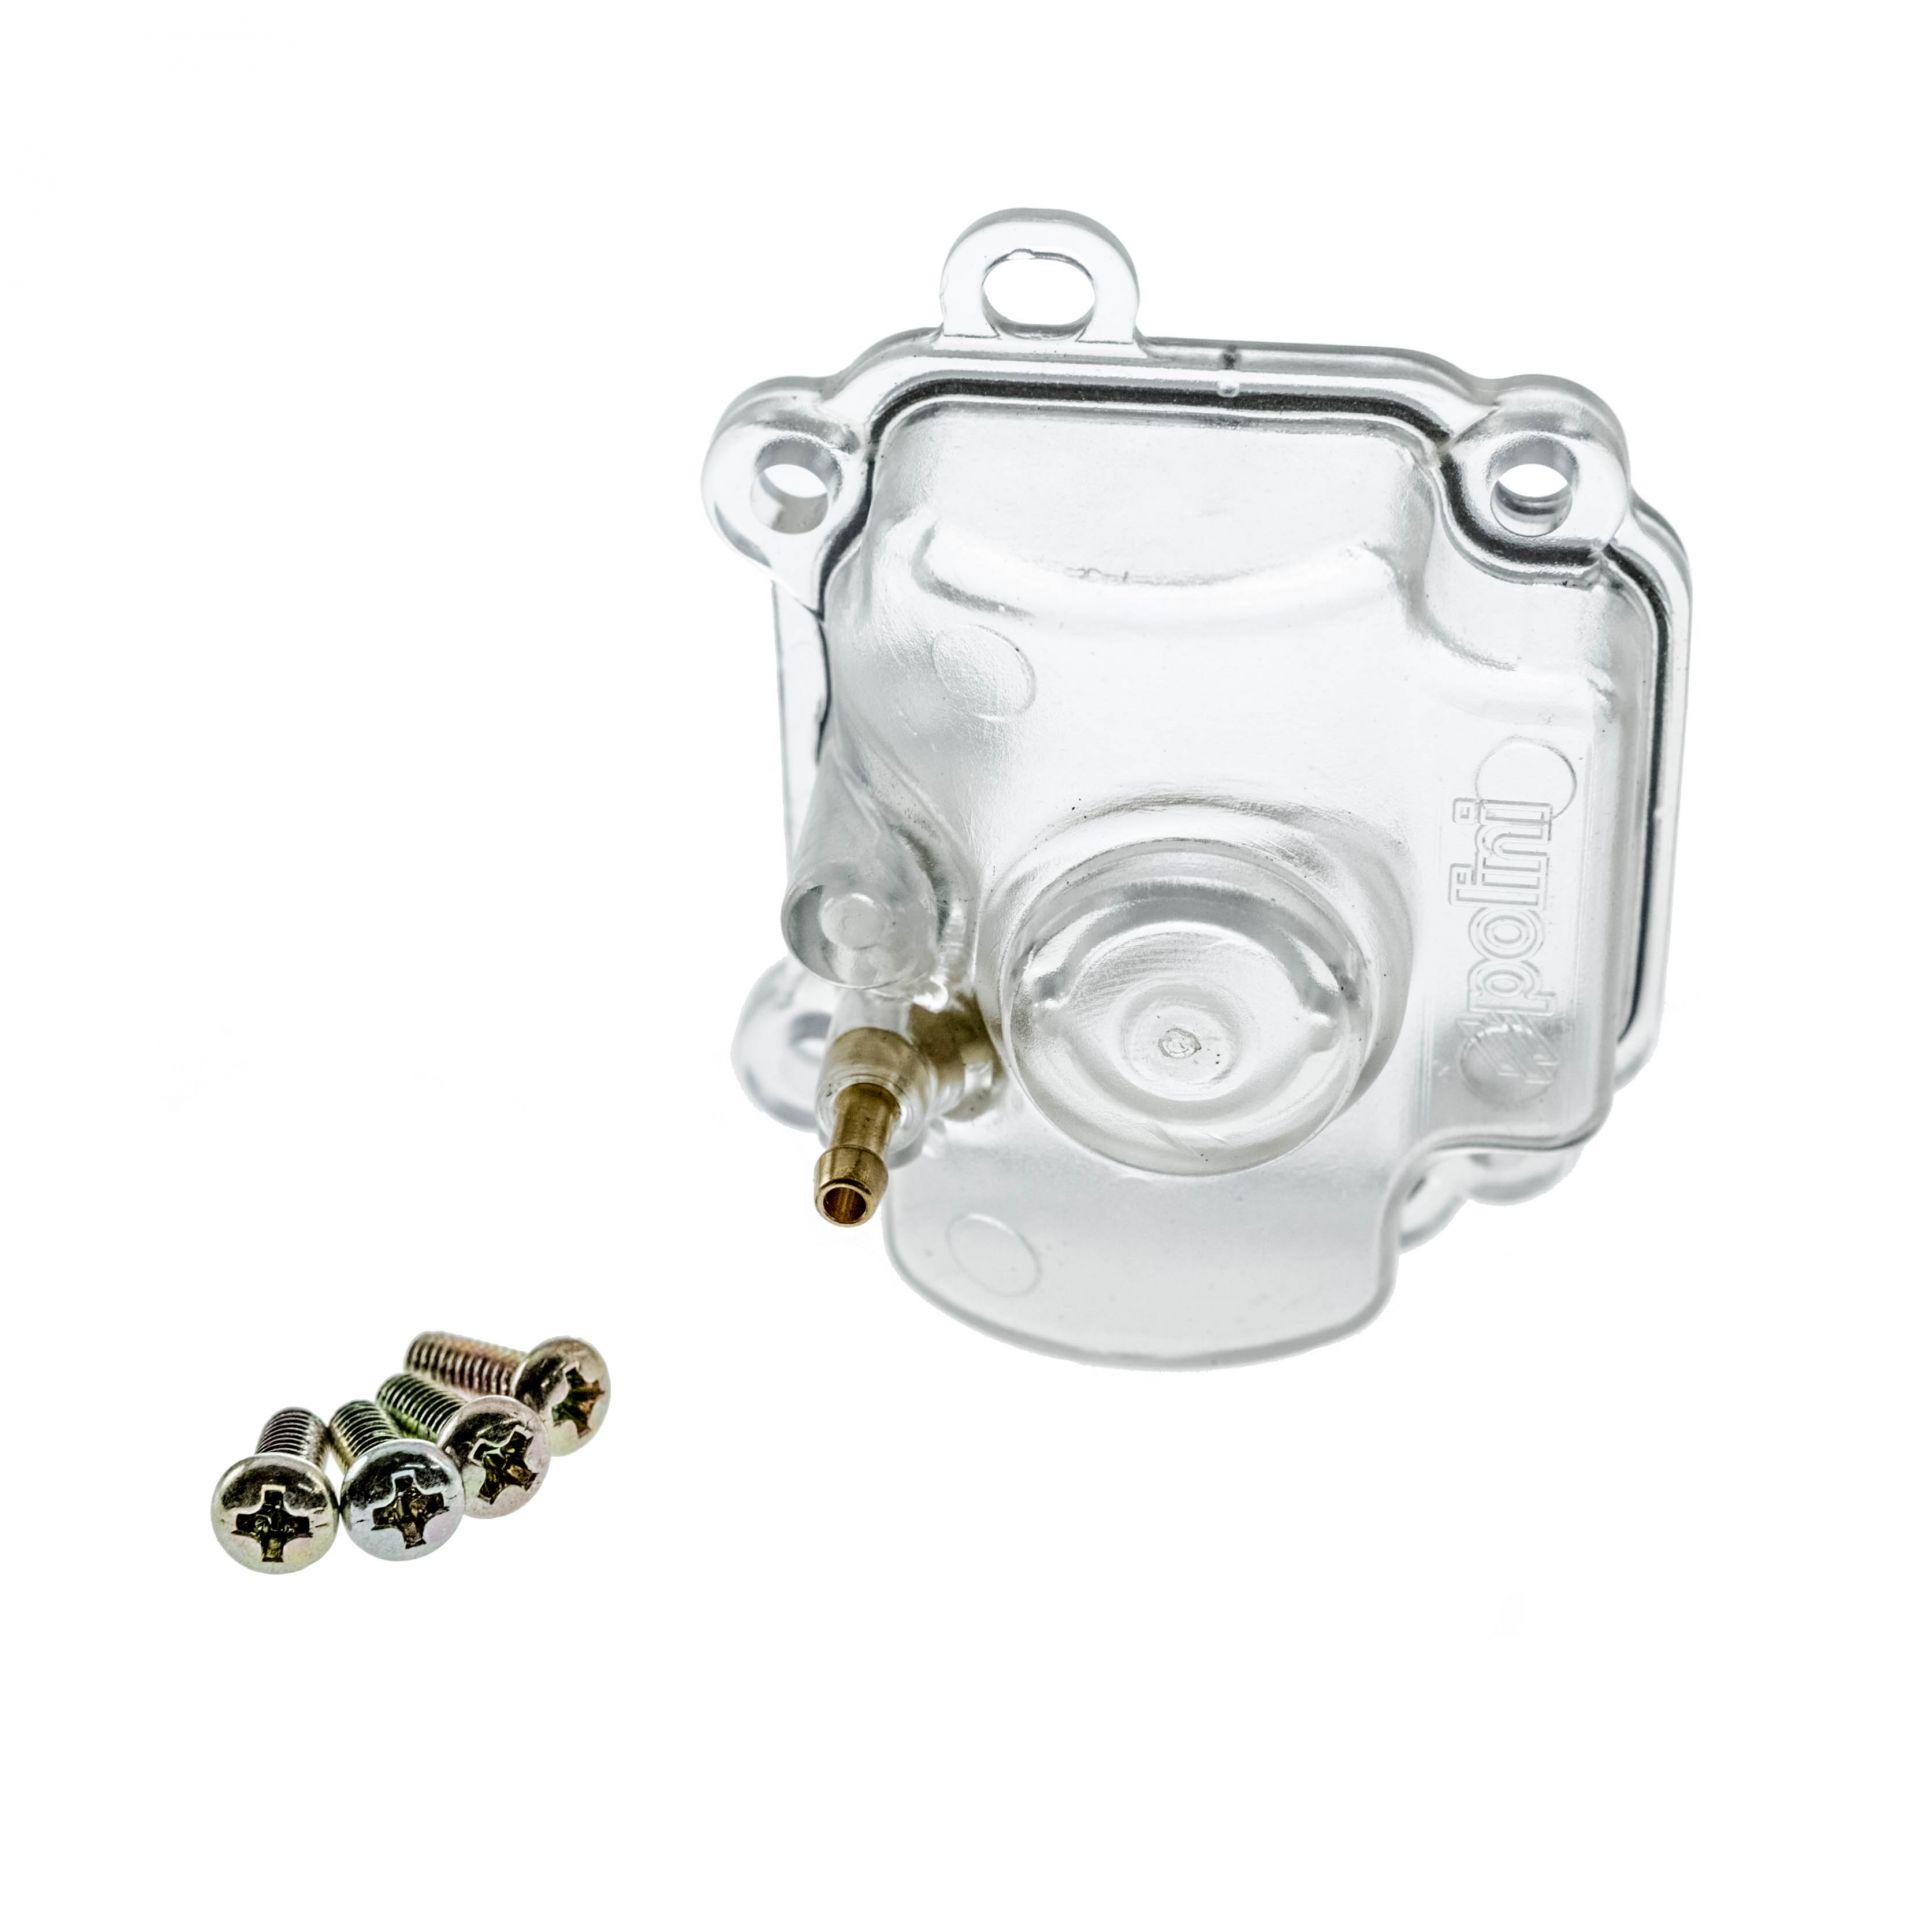 Cuve de carburateur CP Polini transparente